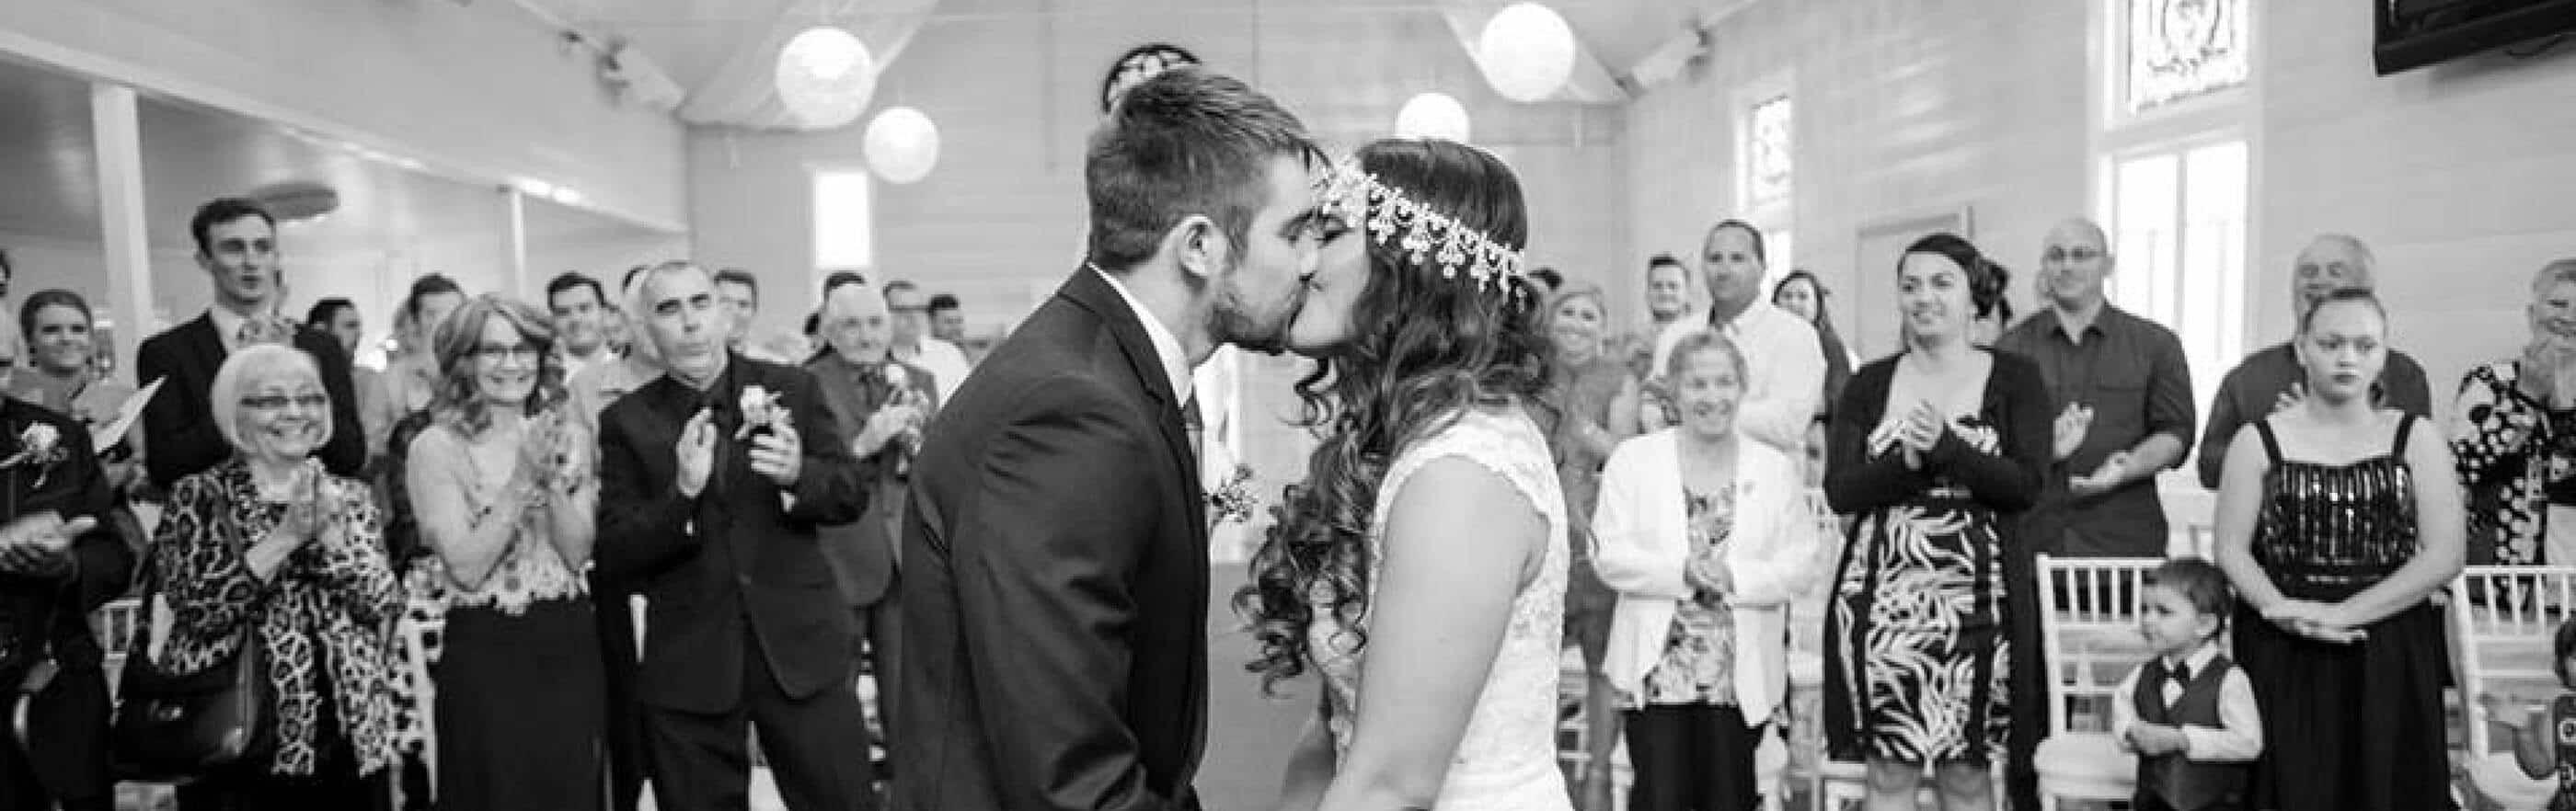 wedding-bw